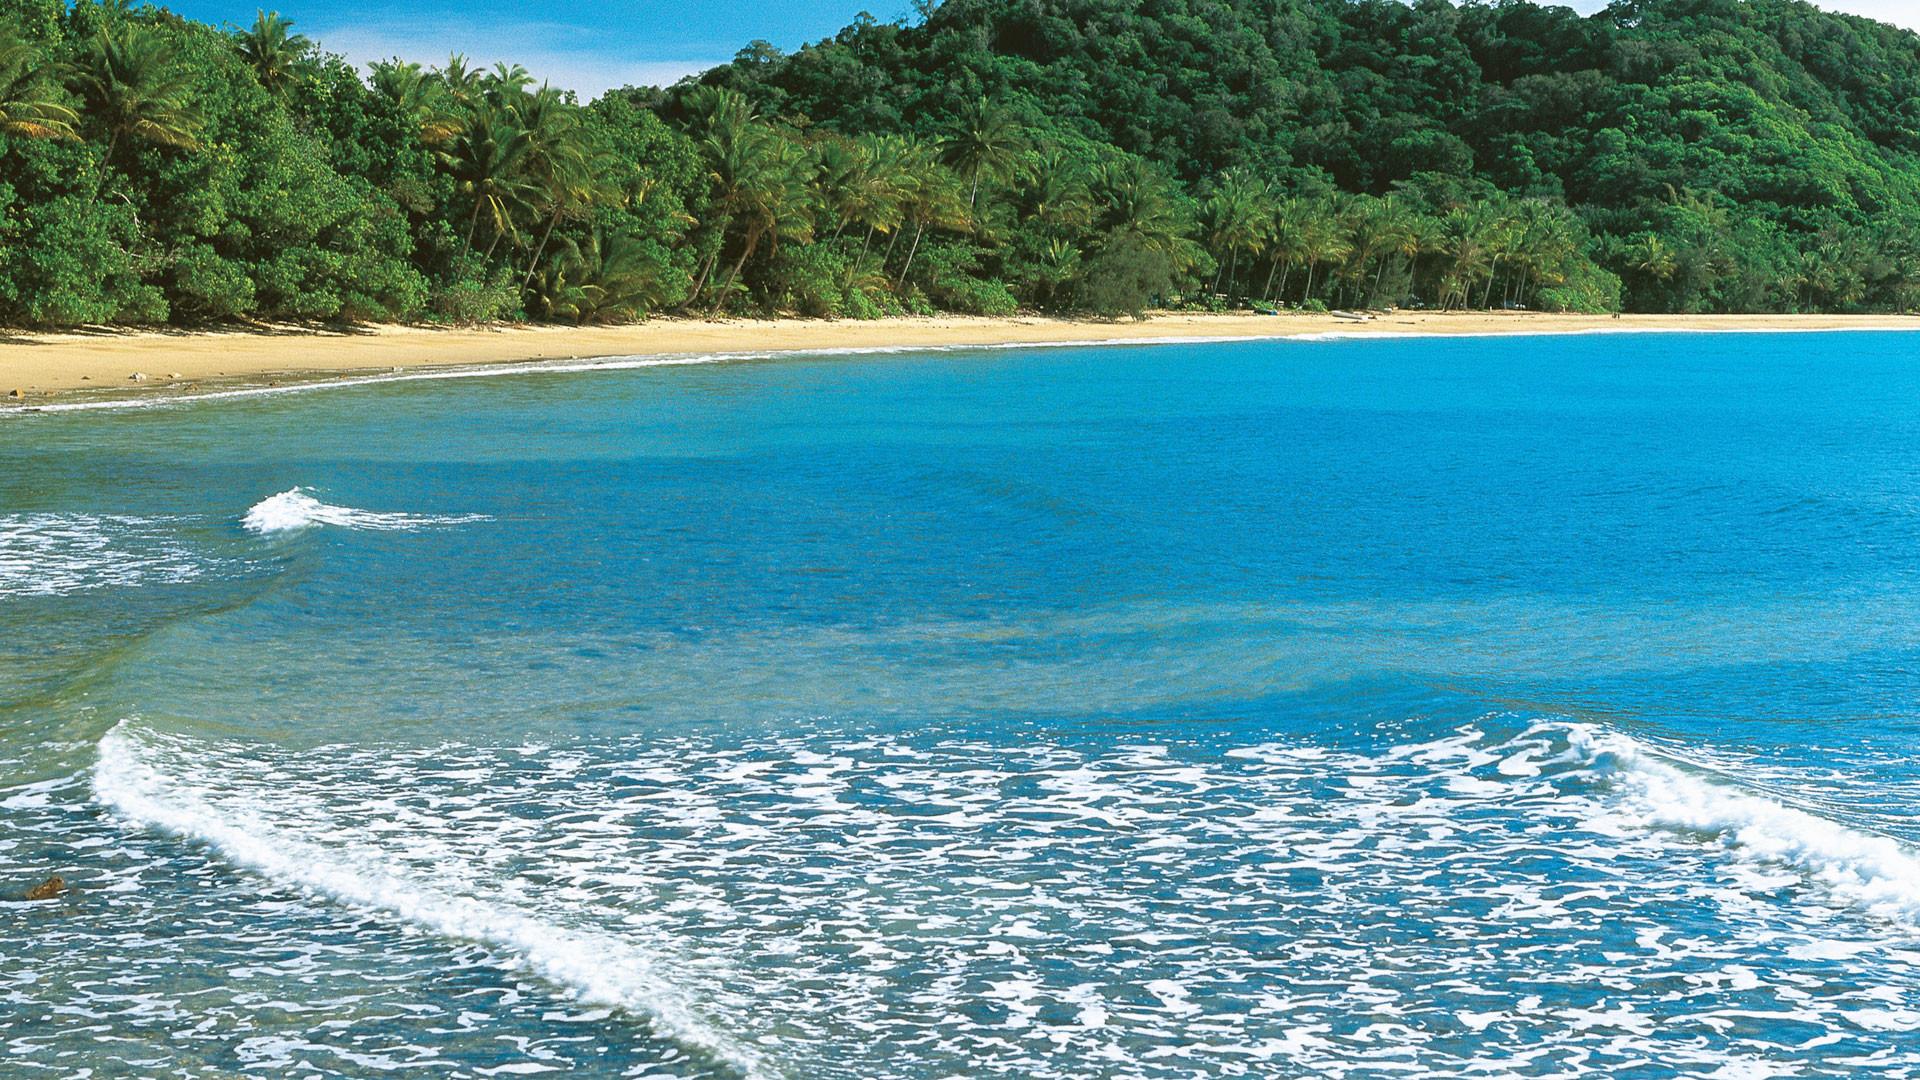 Mission beach qld susan wright | ImgStocks.com